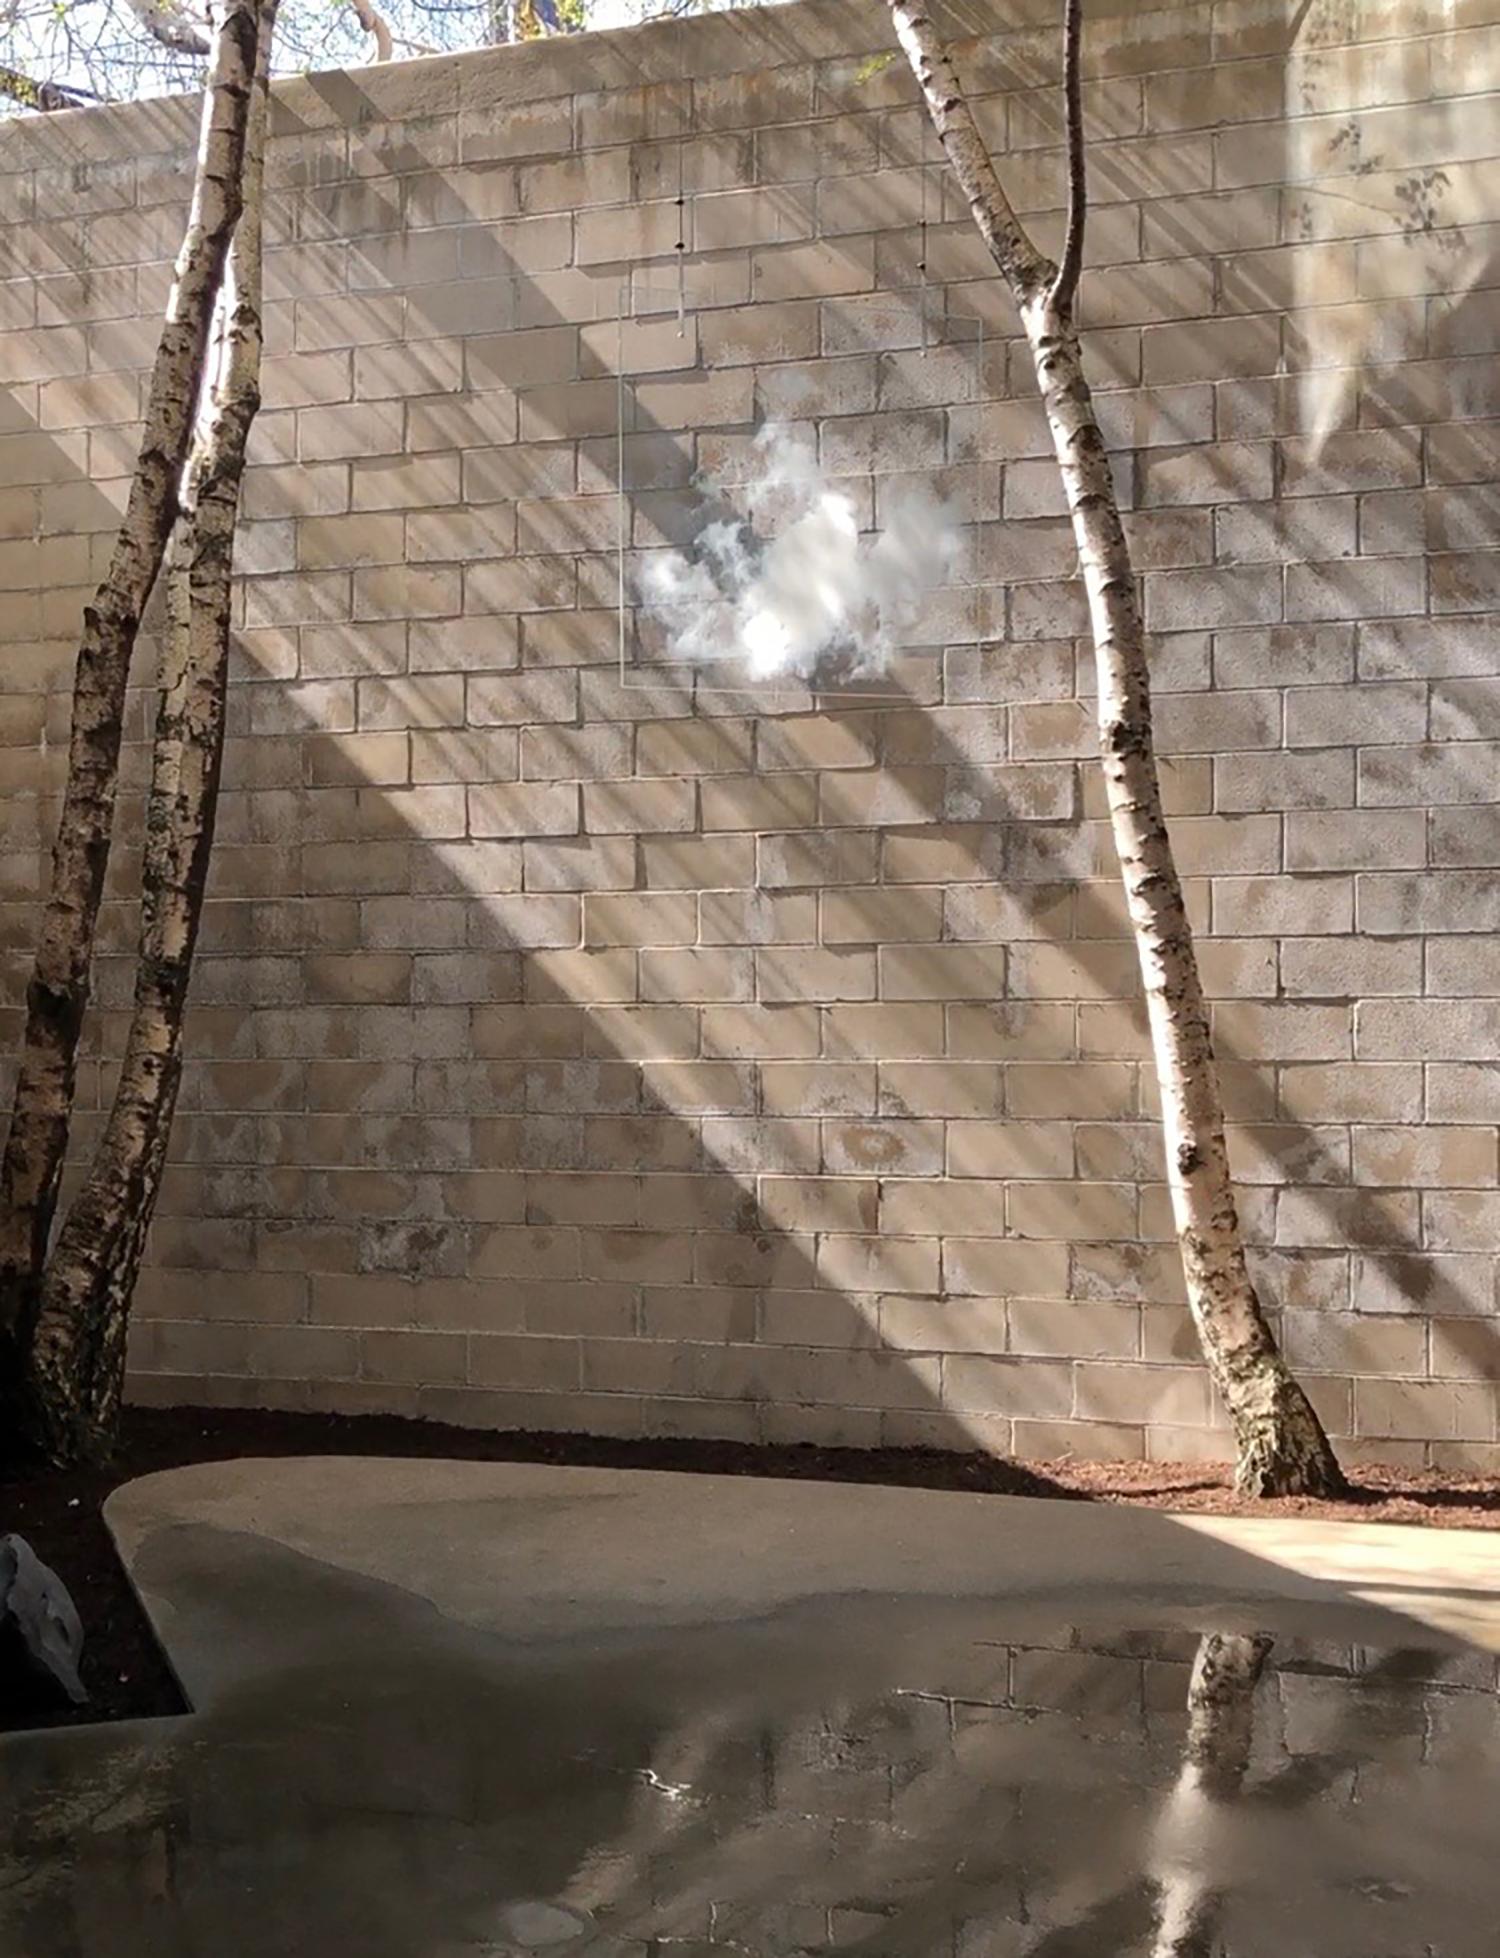 """CLOUDS"" NOGUCHI MUSEUM, NEW YORK 2018"